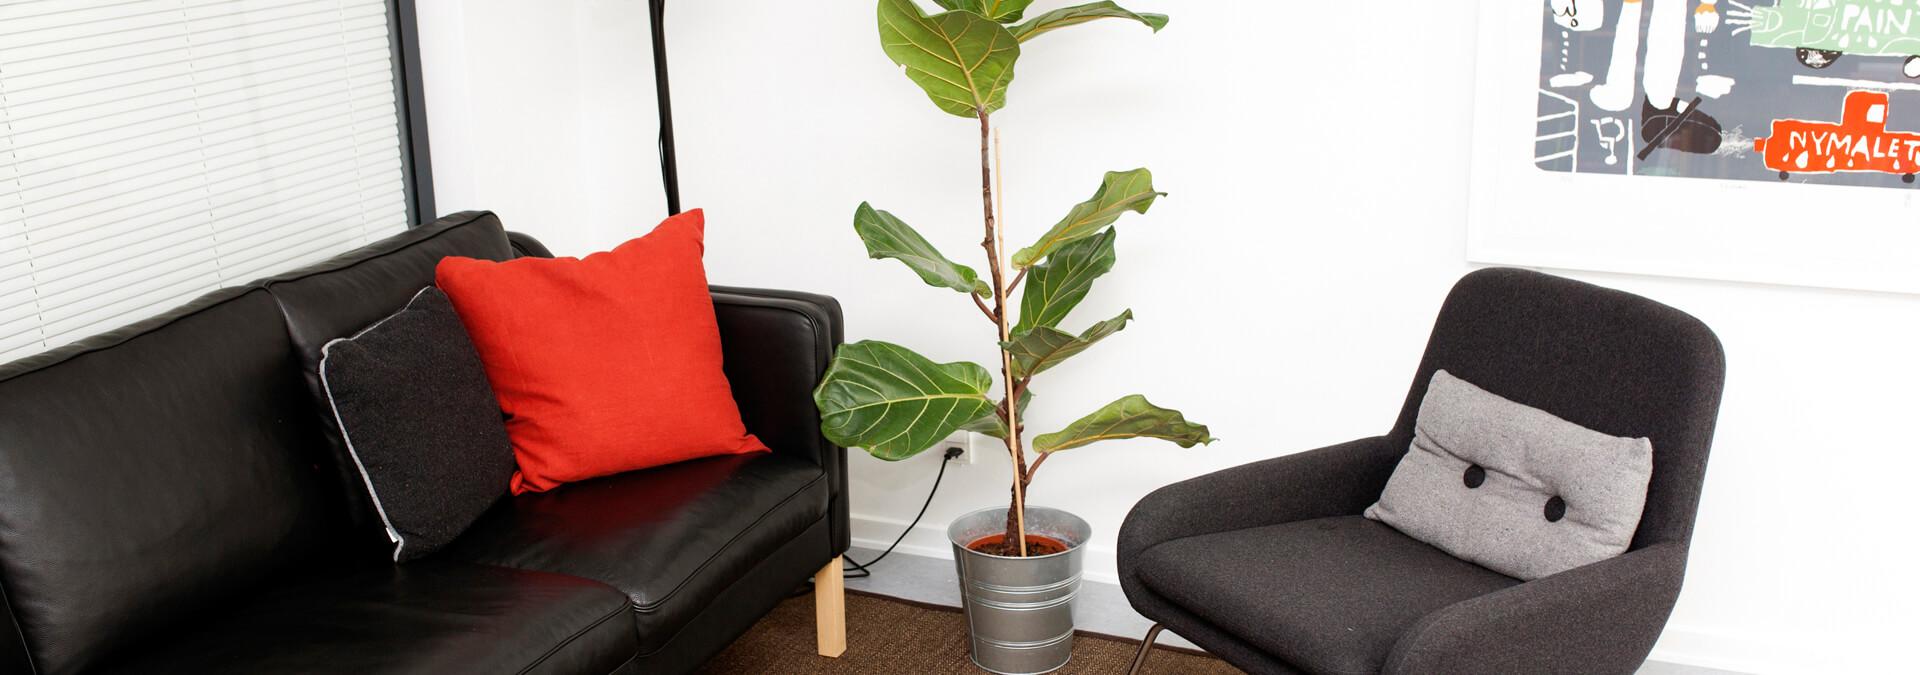 Stue på krisecenter med sofa, stol og plante